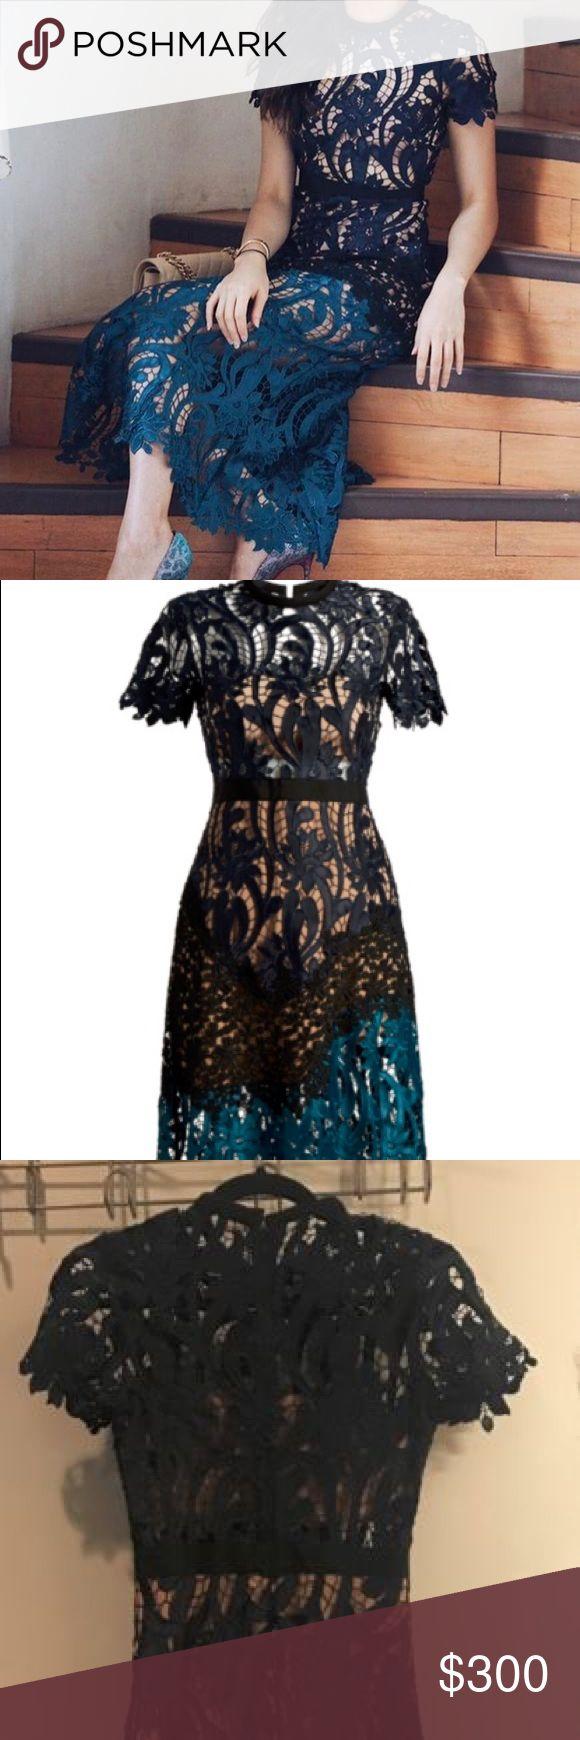 SELF-PORTRAIT Prairie lace midi dress SELF-PORTRAIT Prairie lace midi dress, Navy/Teal, UK 4, US 0, $510 Dresses Midi